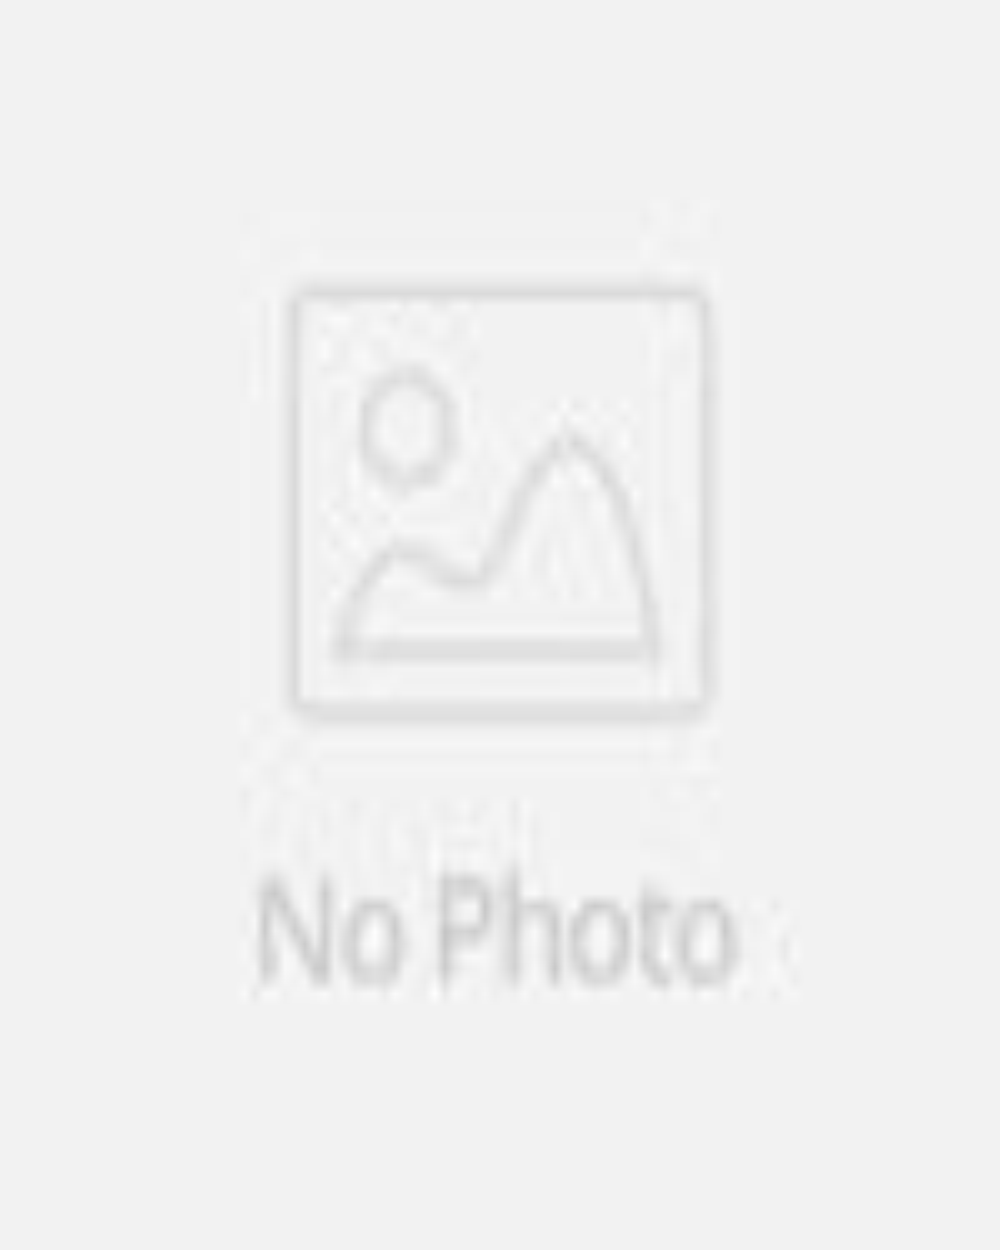 Modest Prom Dresses For Less 49